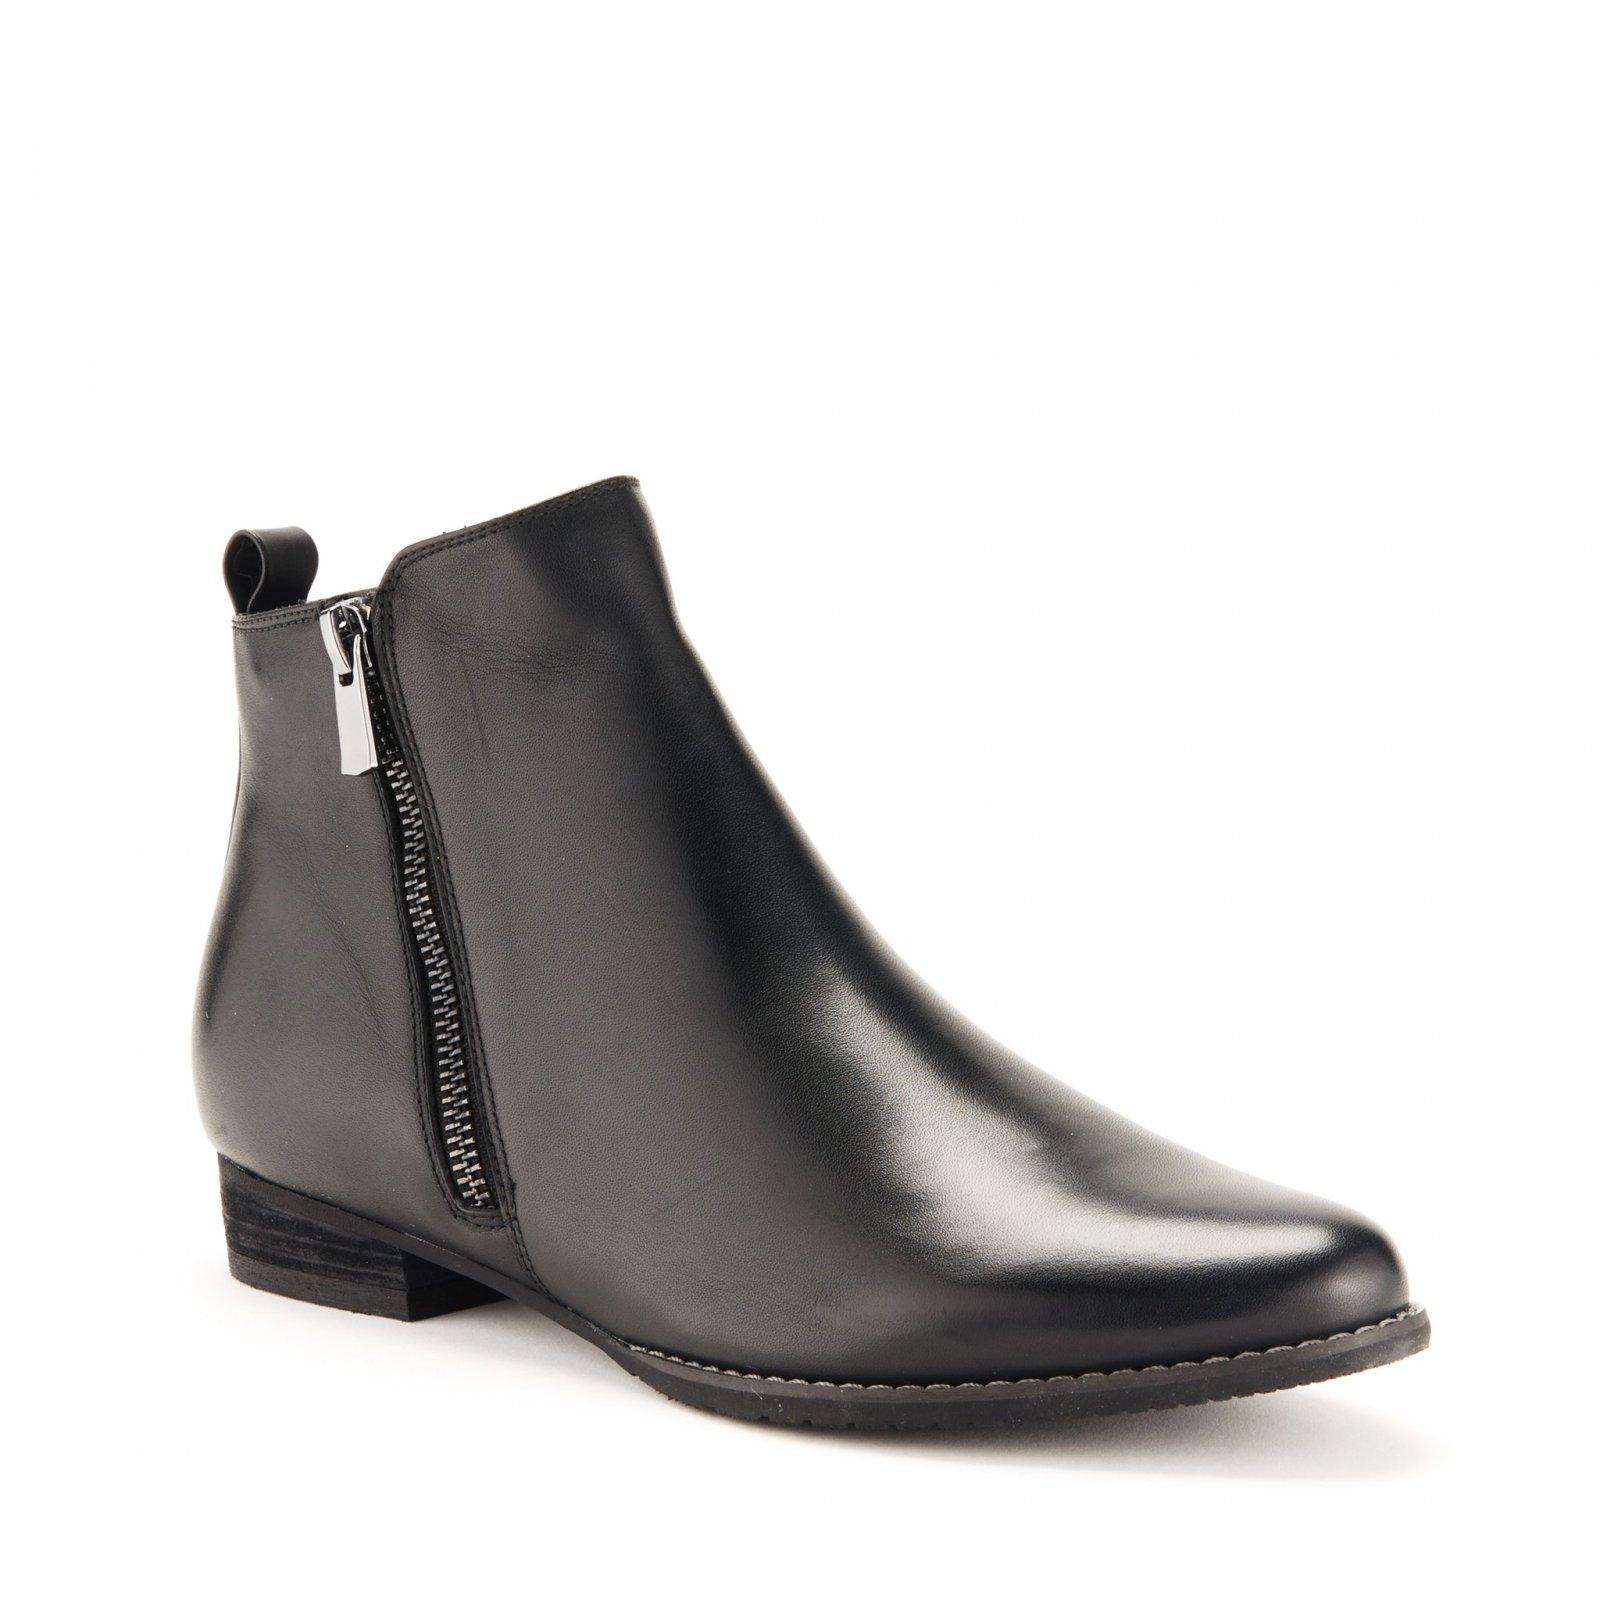 Blondo Lynne Ankle Boot